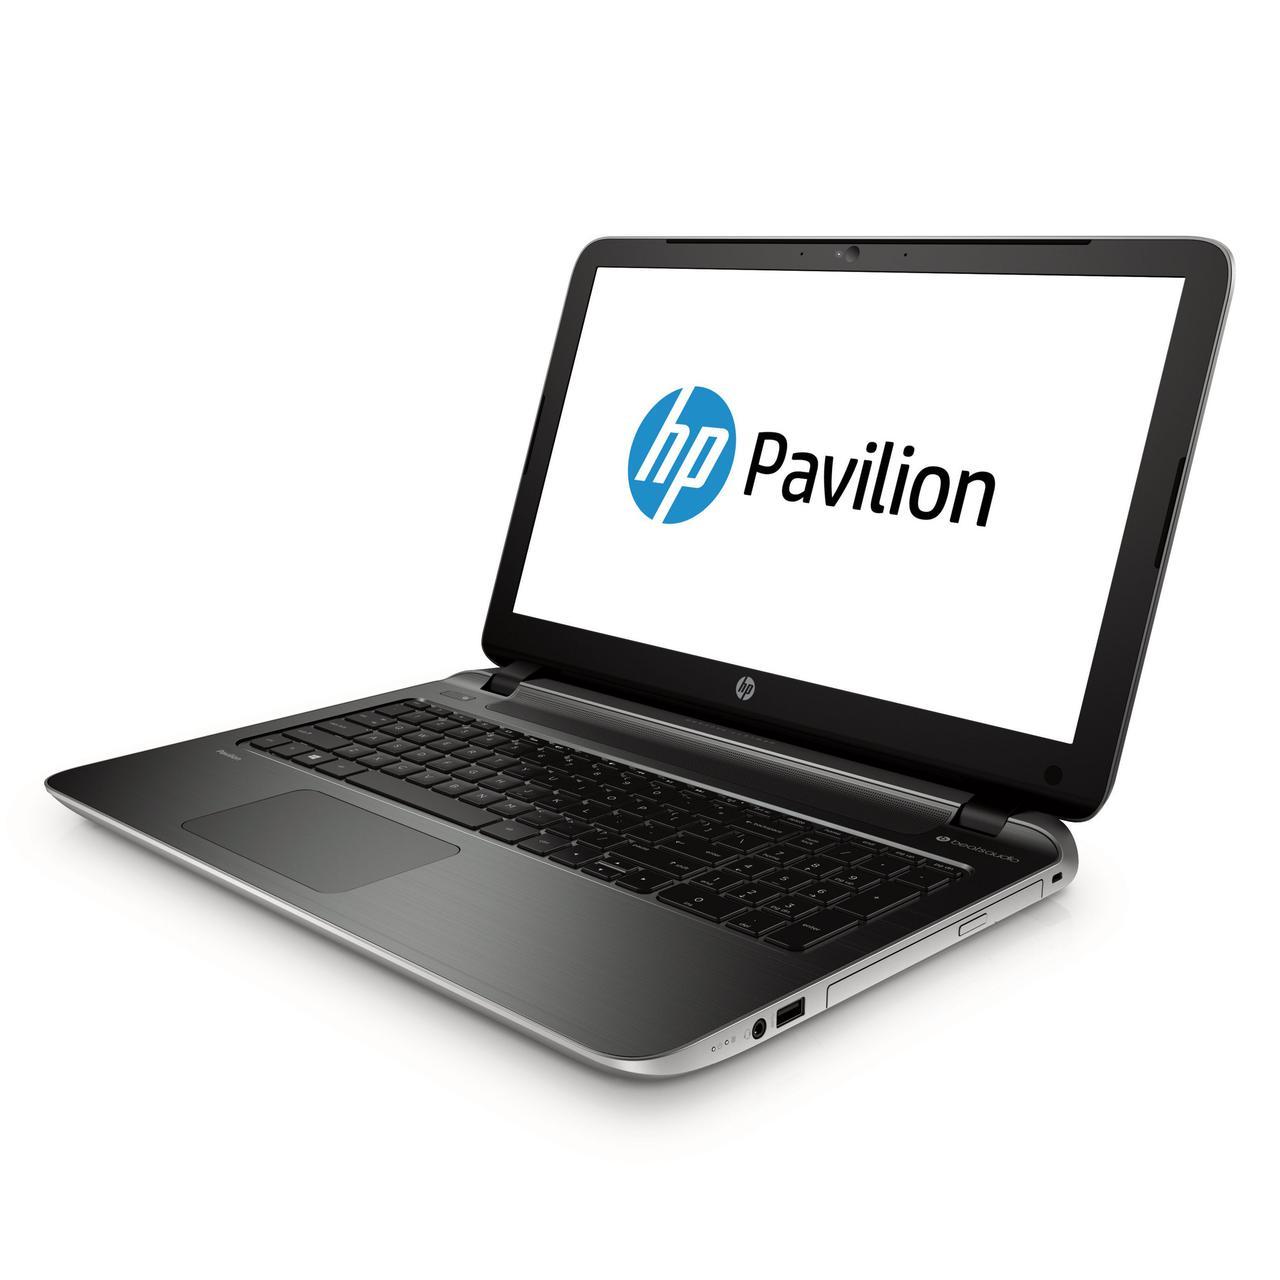 "Ноутбук HP Pavilion 15-ay040ng - 15,6 ""N3060/4ГБ/500 ГБ/FHD ""Over-Stock"""